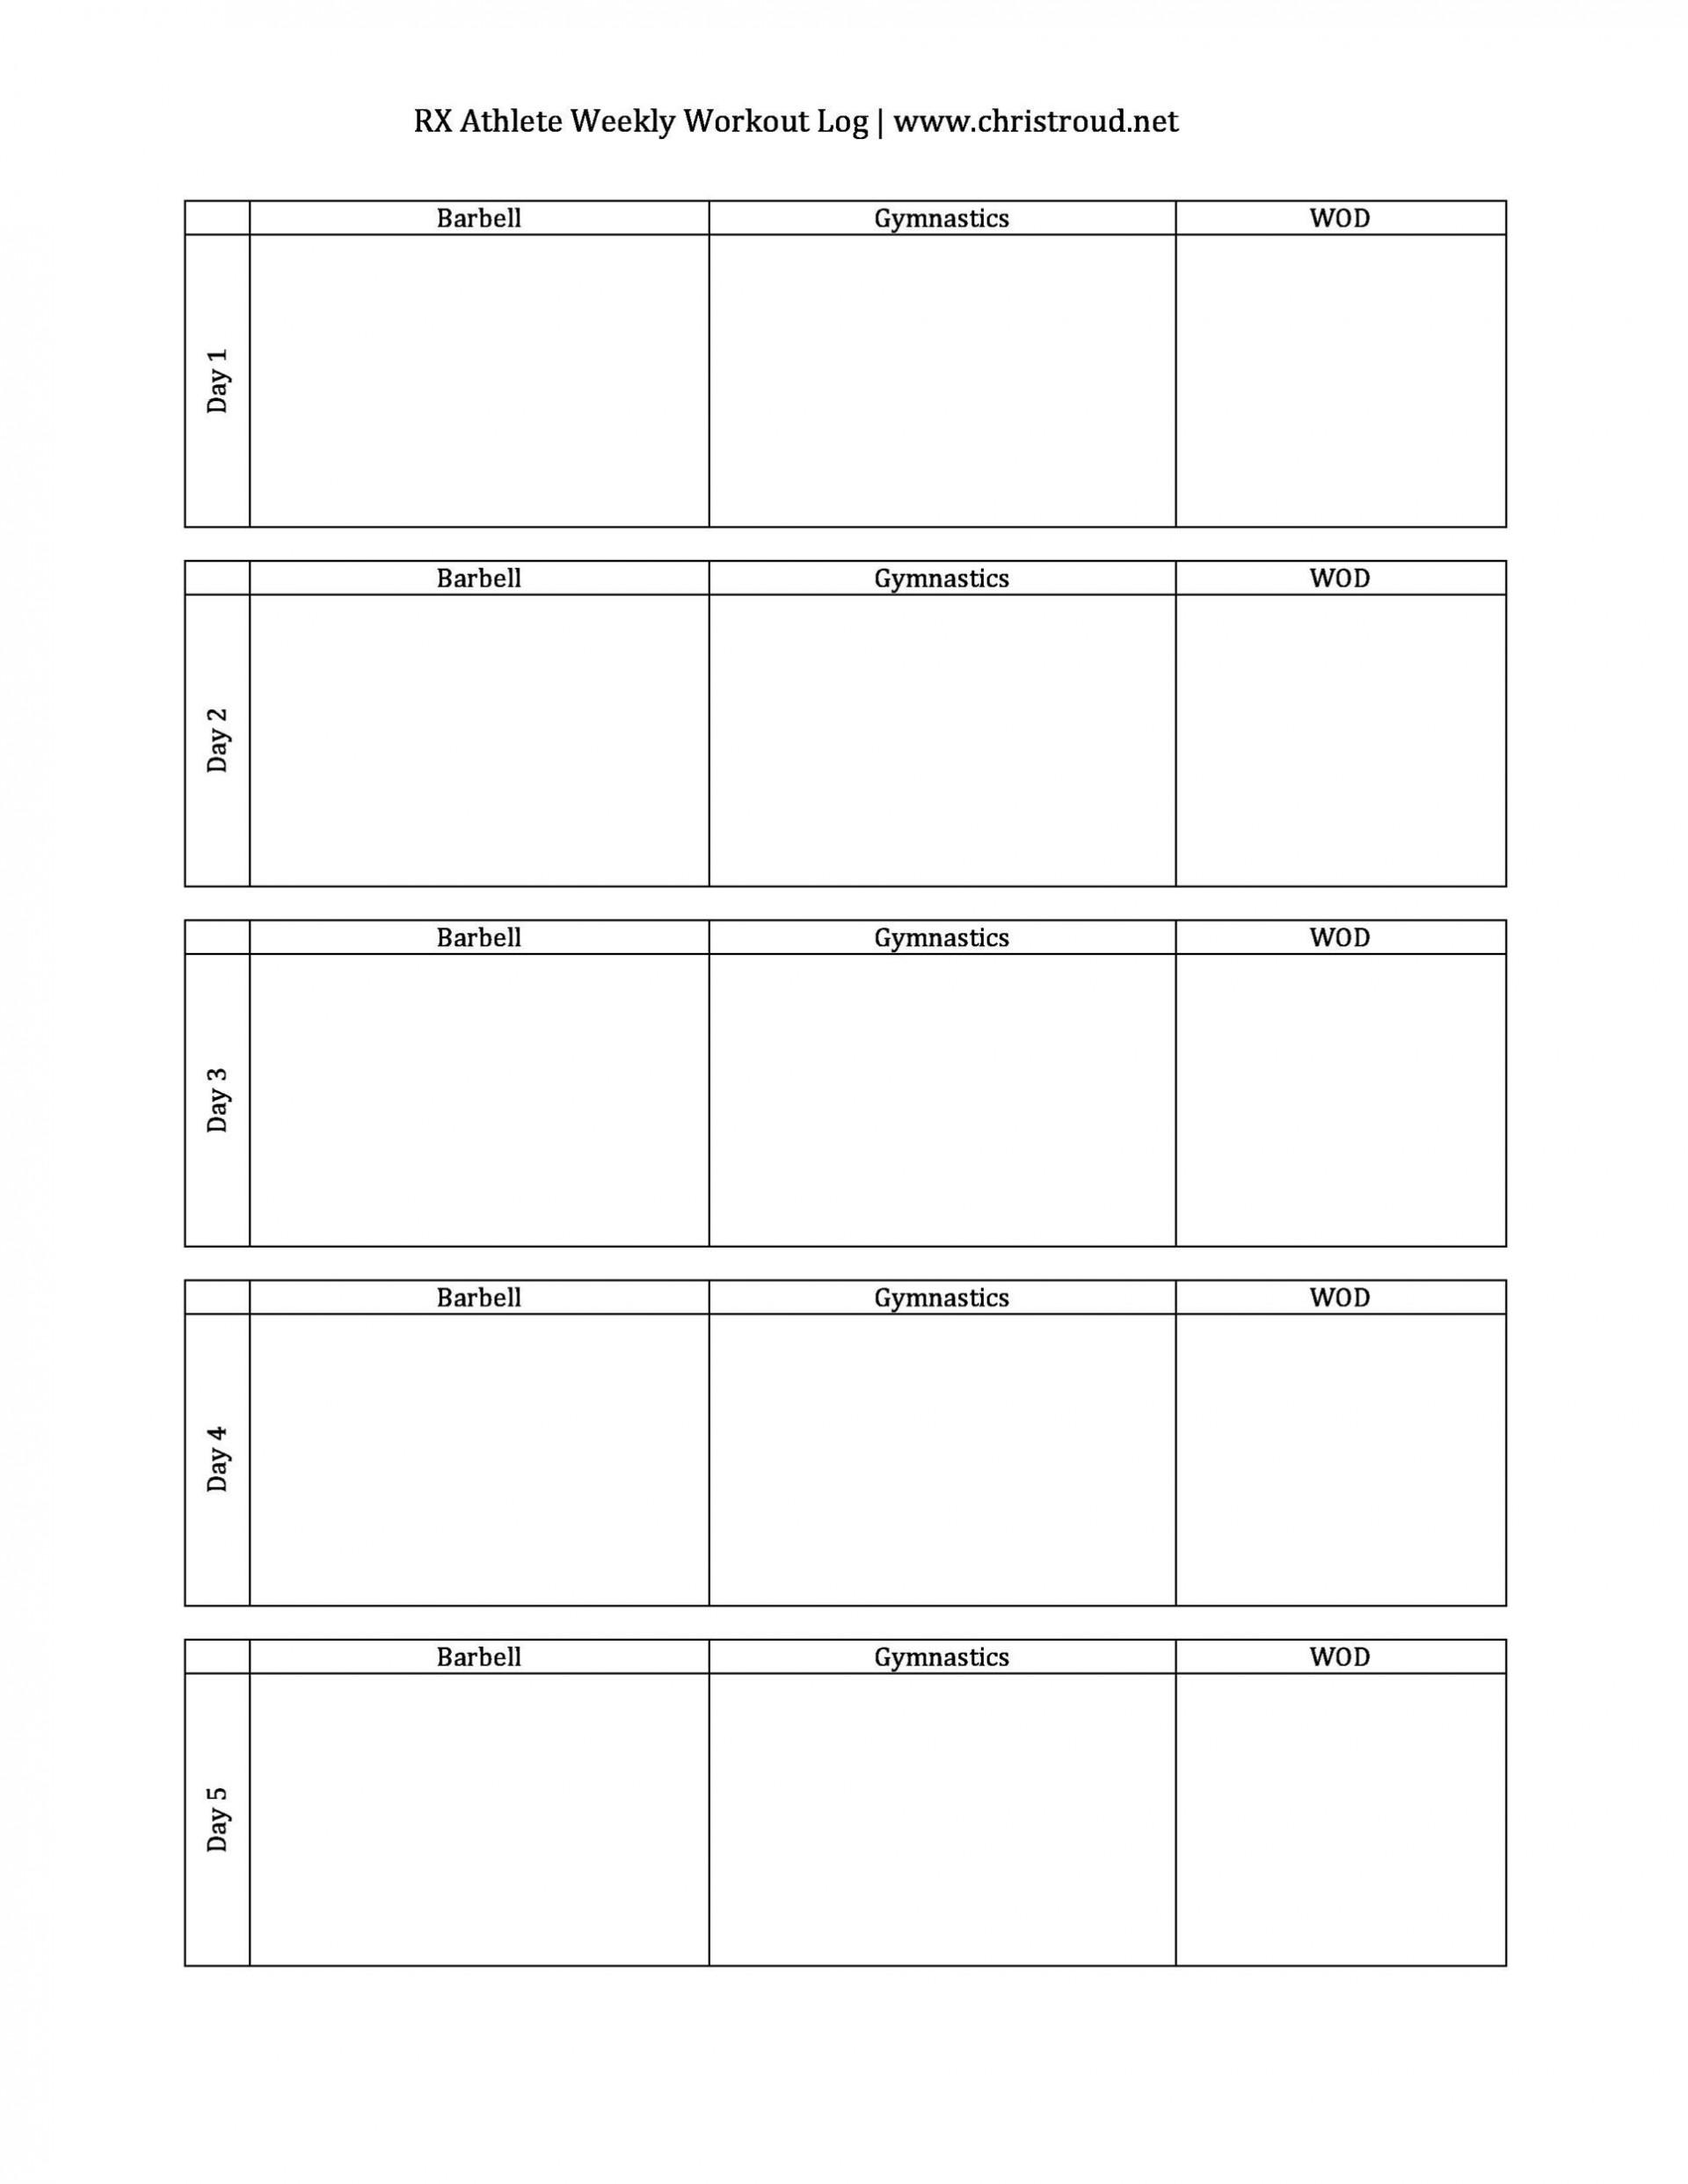 008 Marvelou Weekly Workout Schedule Template Idea  12 Week Plan Training Calendar1920